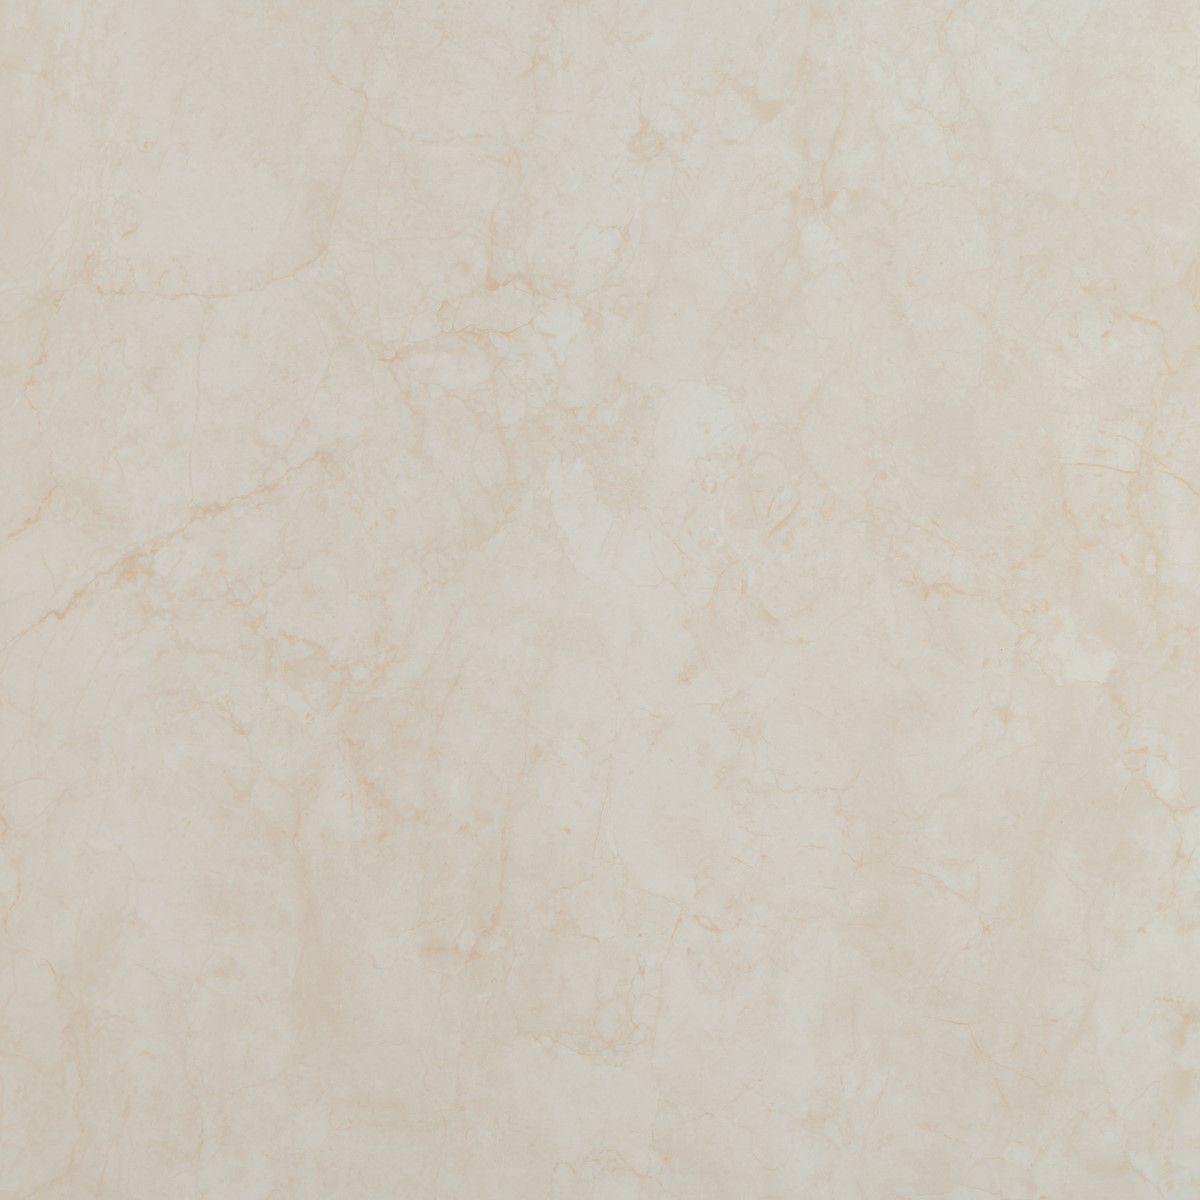 60x60 cm caledonia marfil